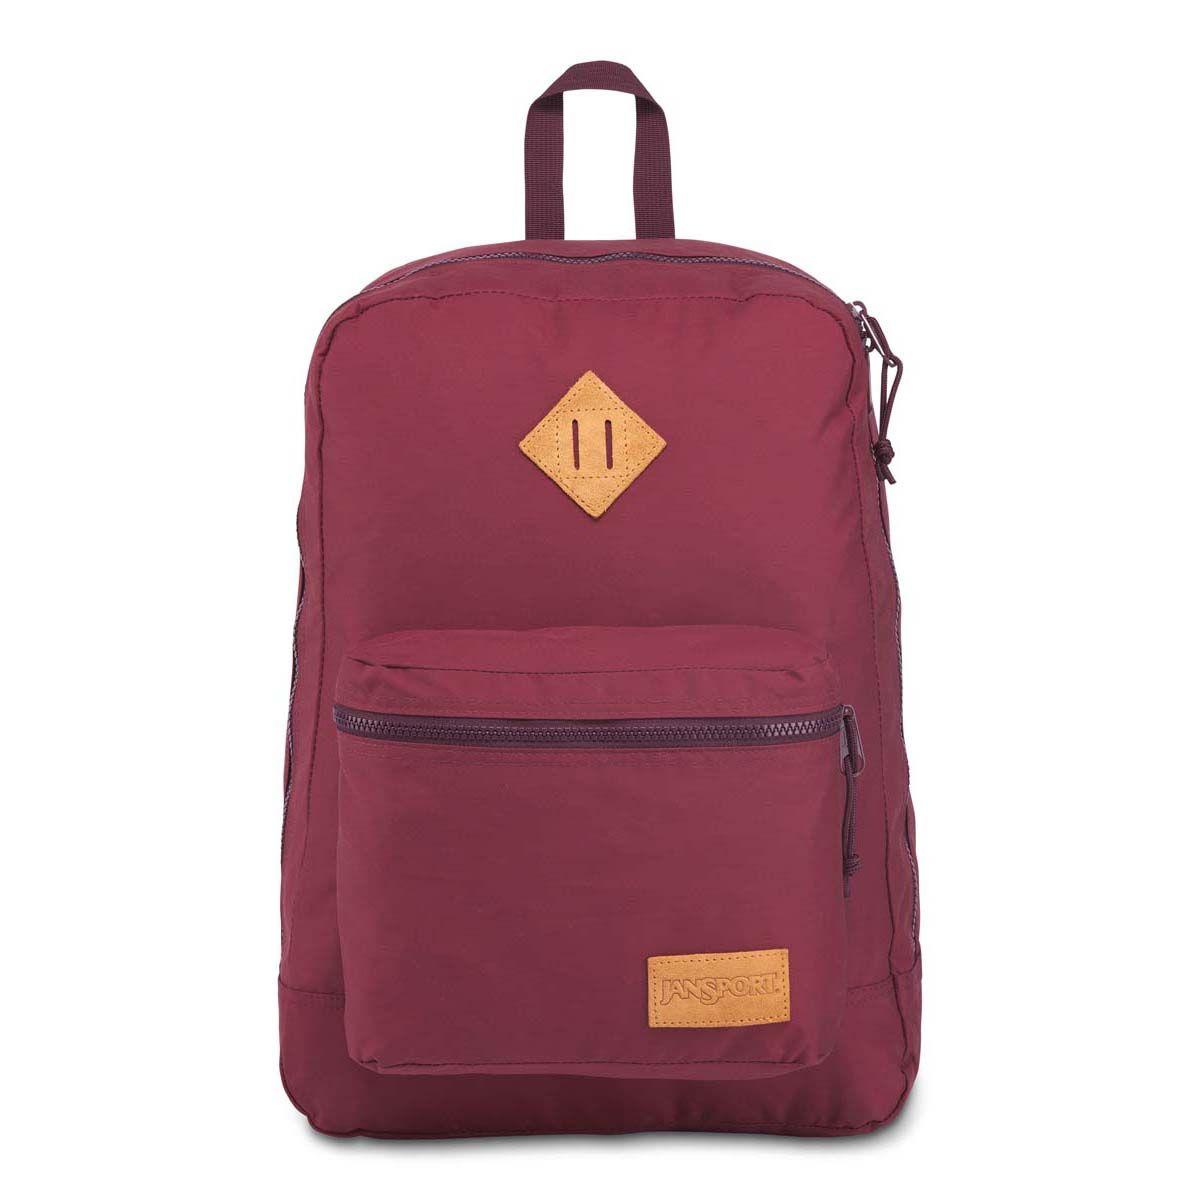 JanSport Super Lite Backpack in Russet Red/Dried Fig